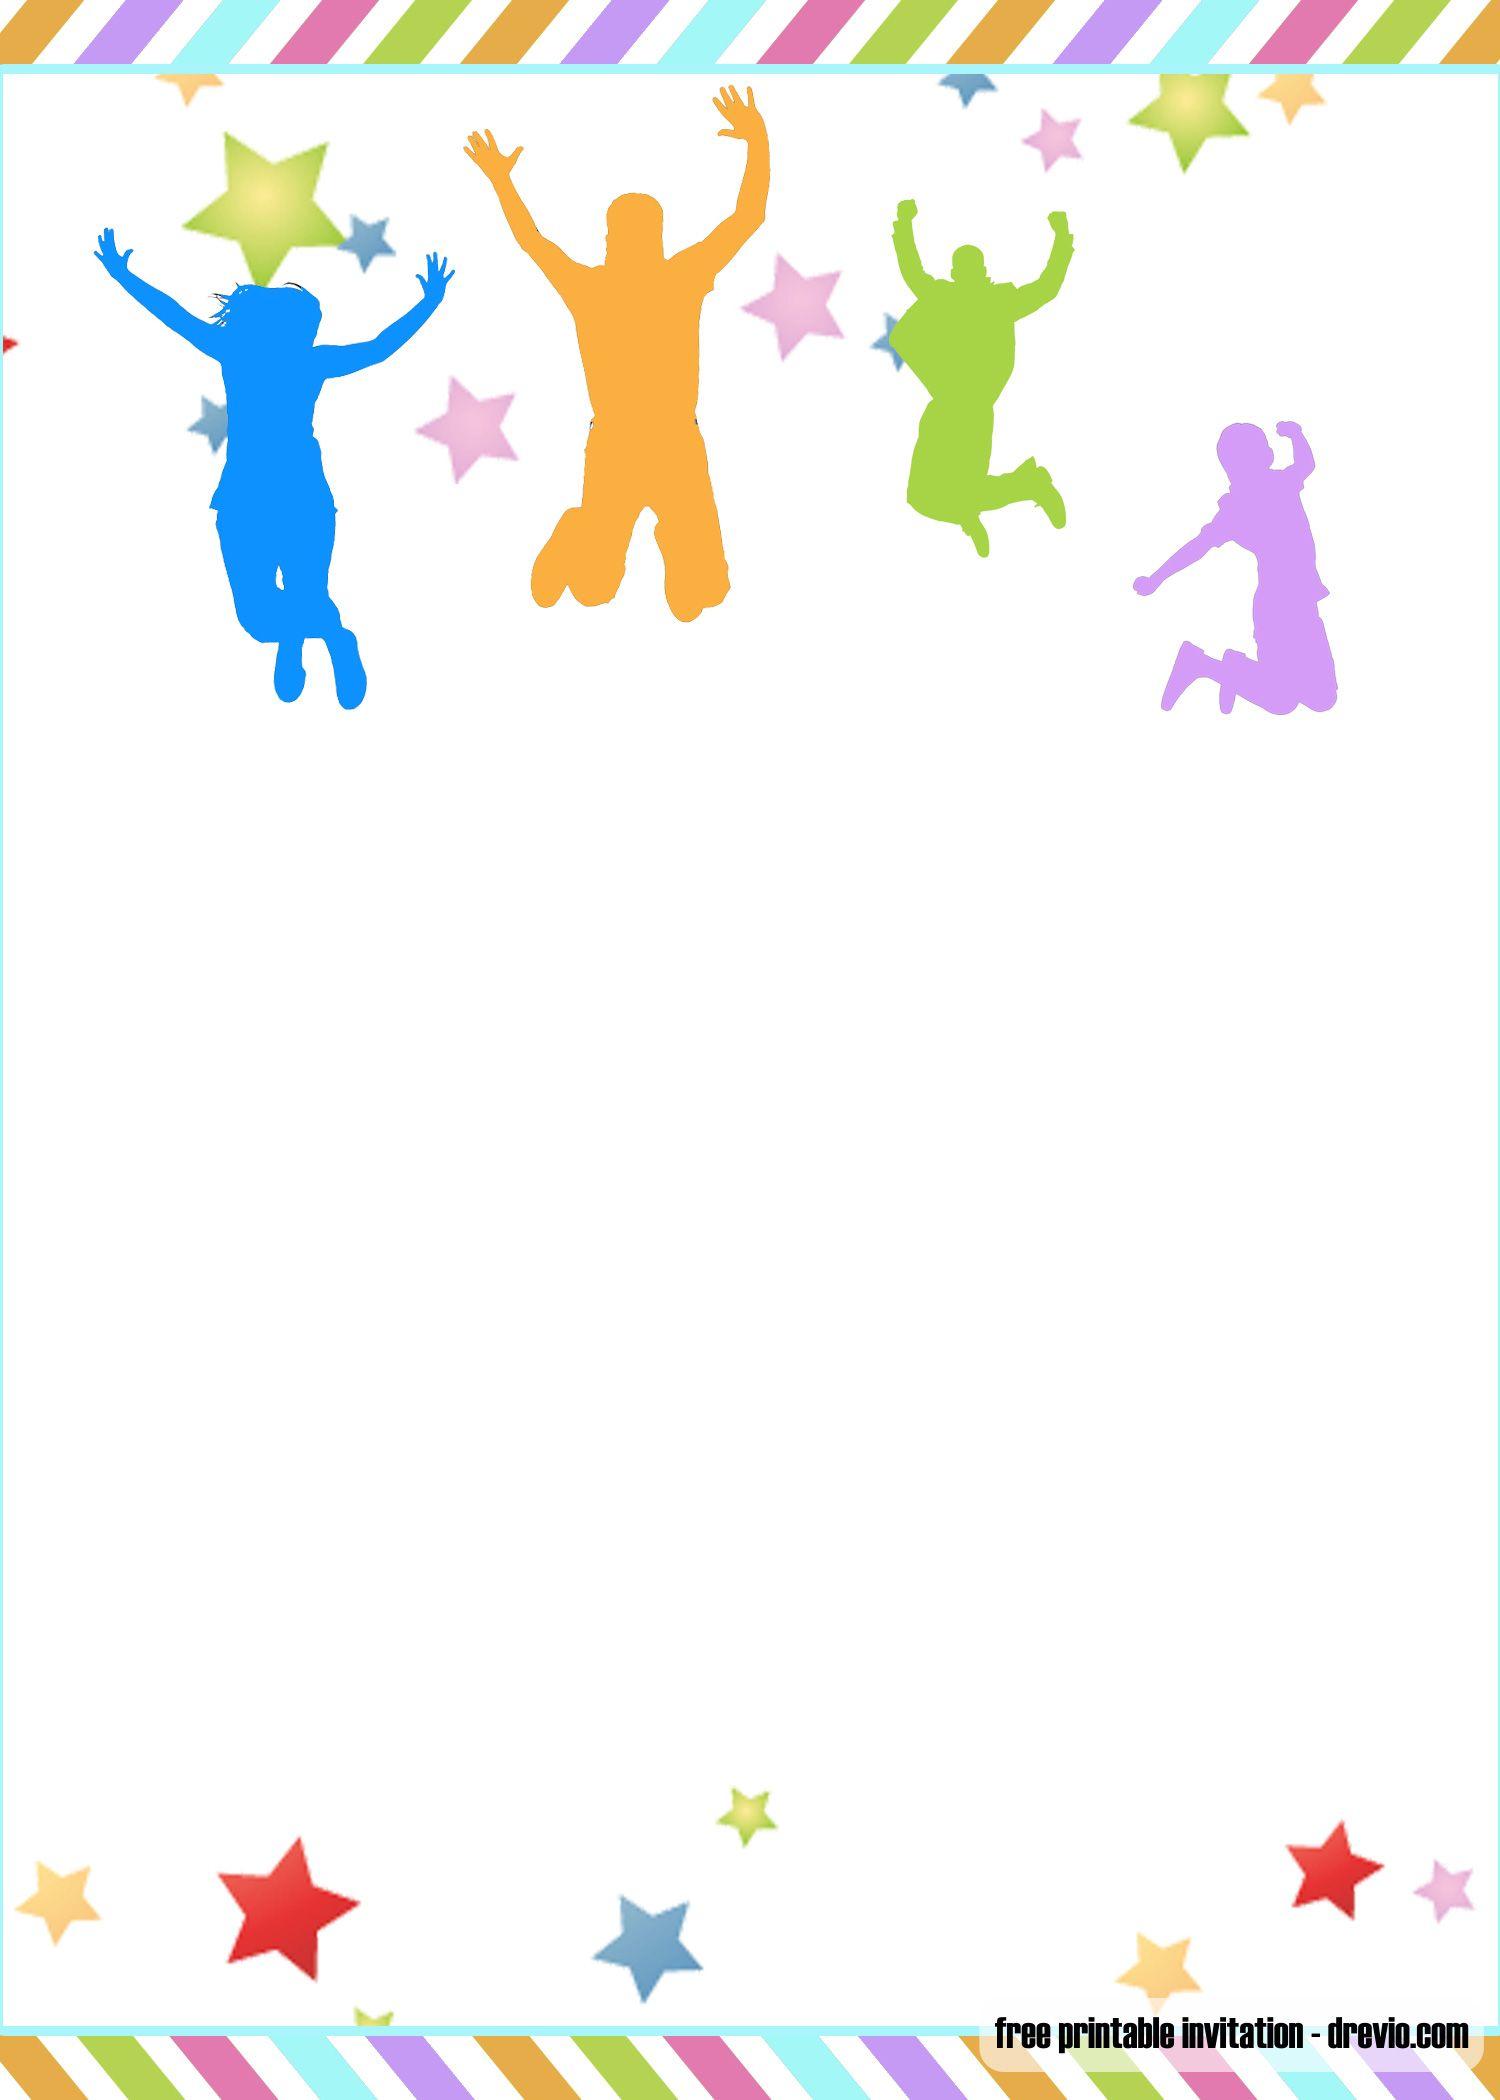 Free Printable Trampoline Jump Birthday Invitation Templates Minion Birthday Invitations Printable Birthday Invitations Birthday Party Invitations Printable